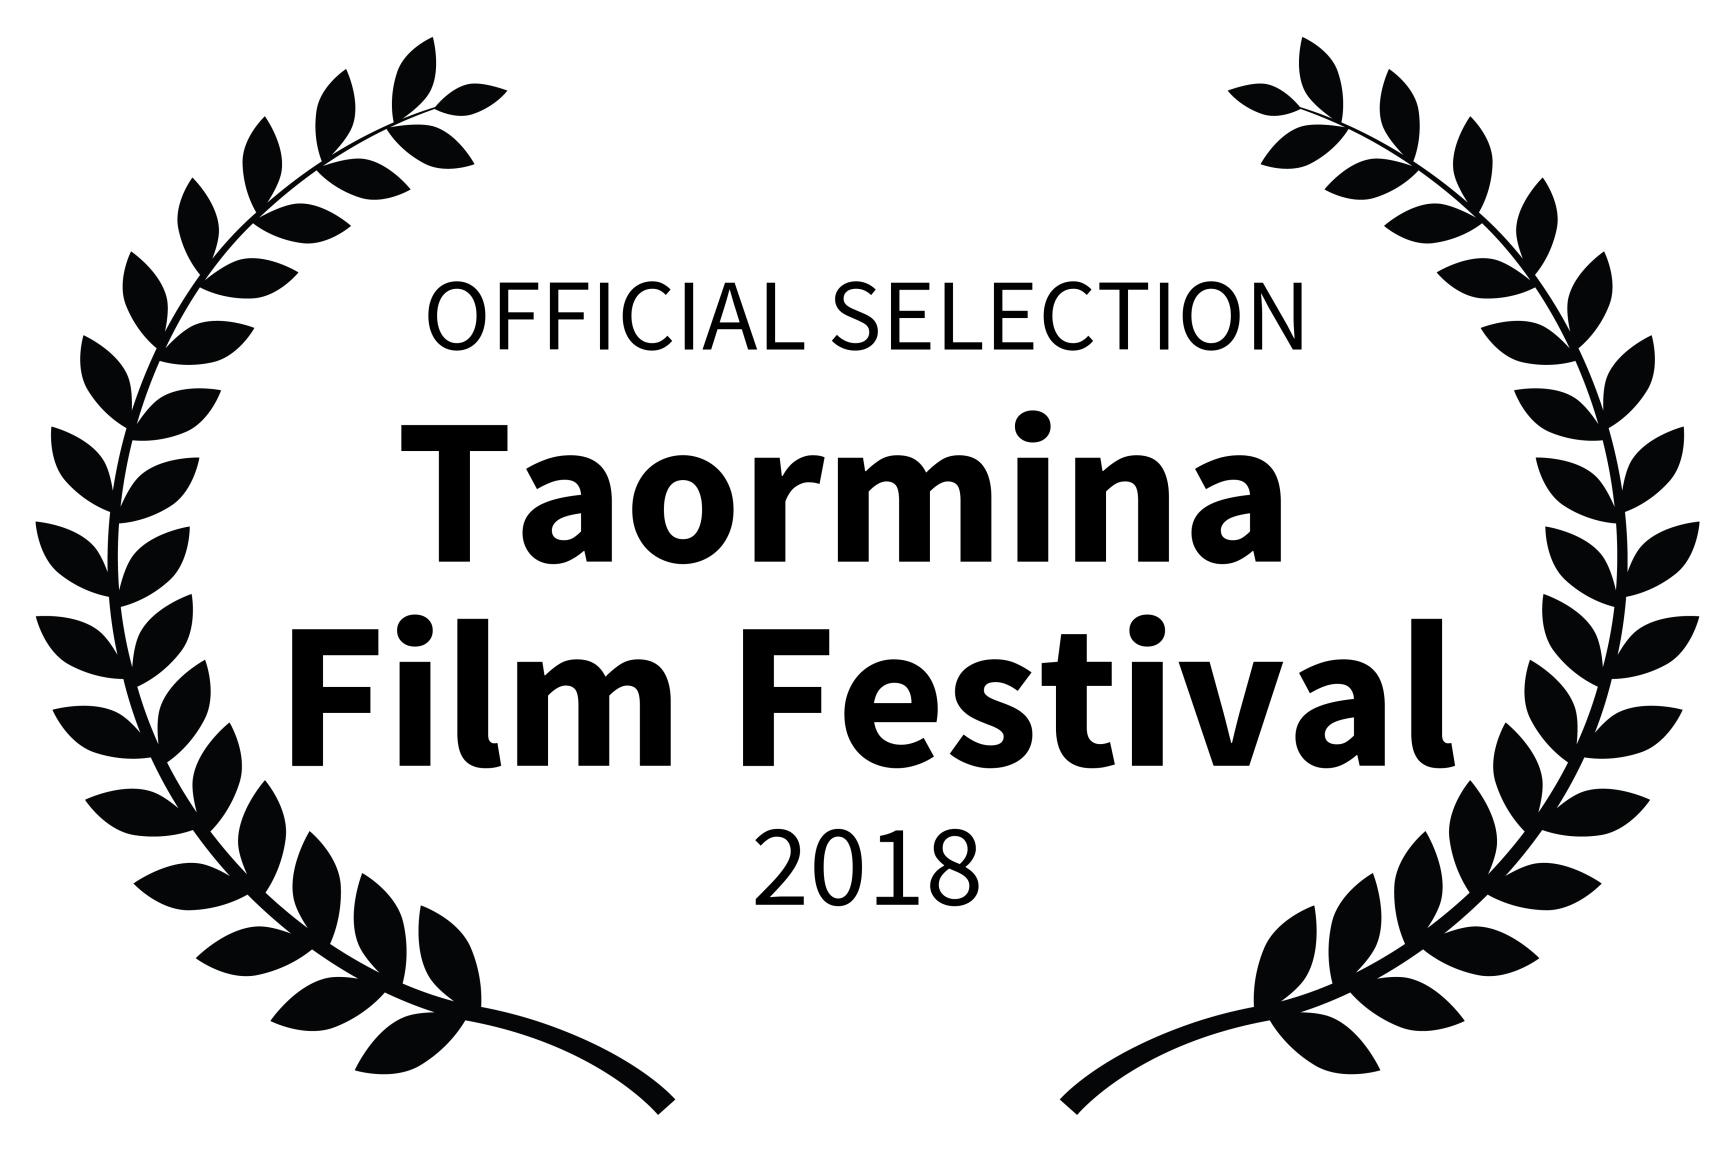 OFFICIAL SELECTION - Taormina  Film Festival - 2018.jpg